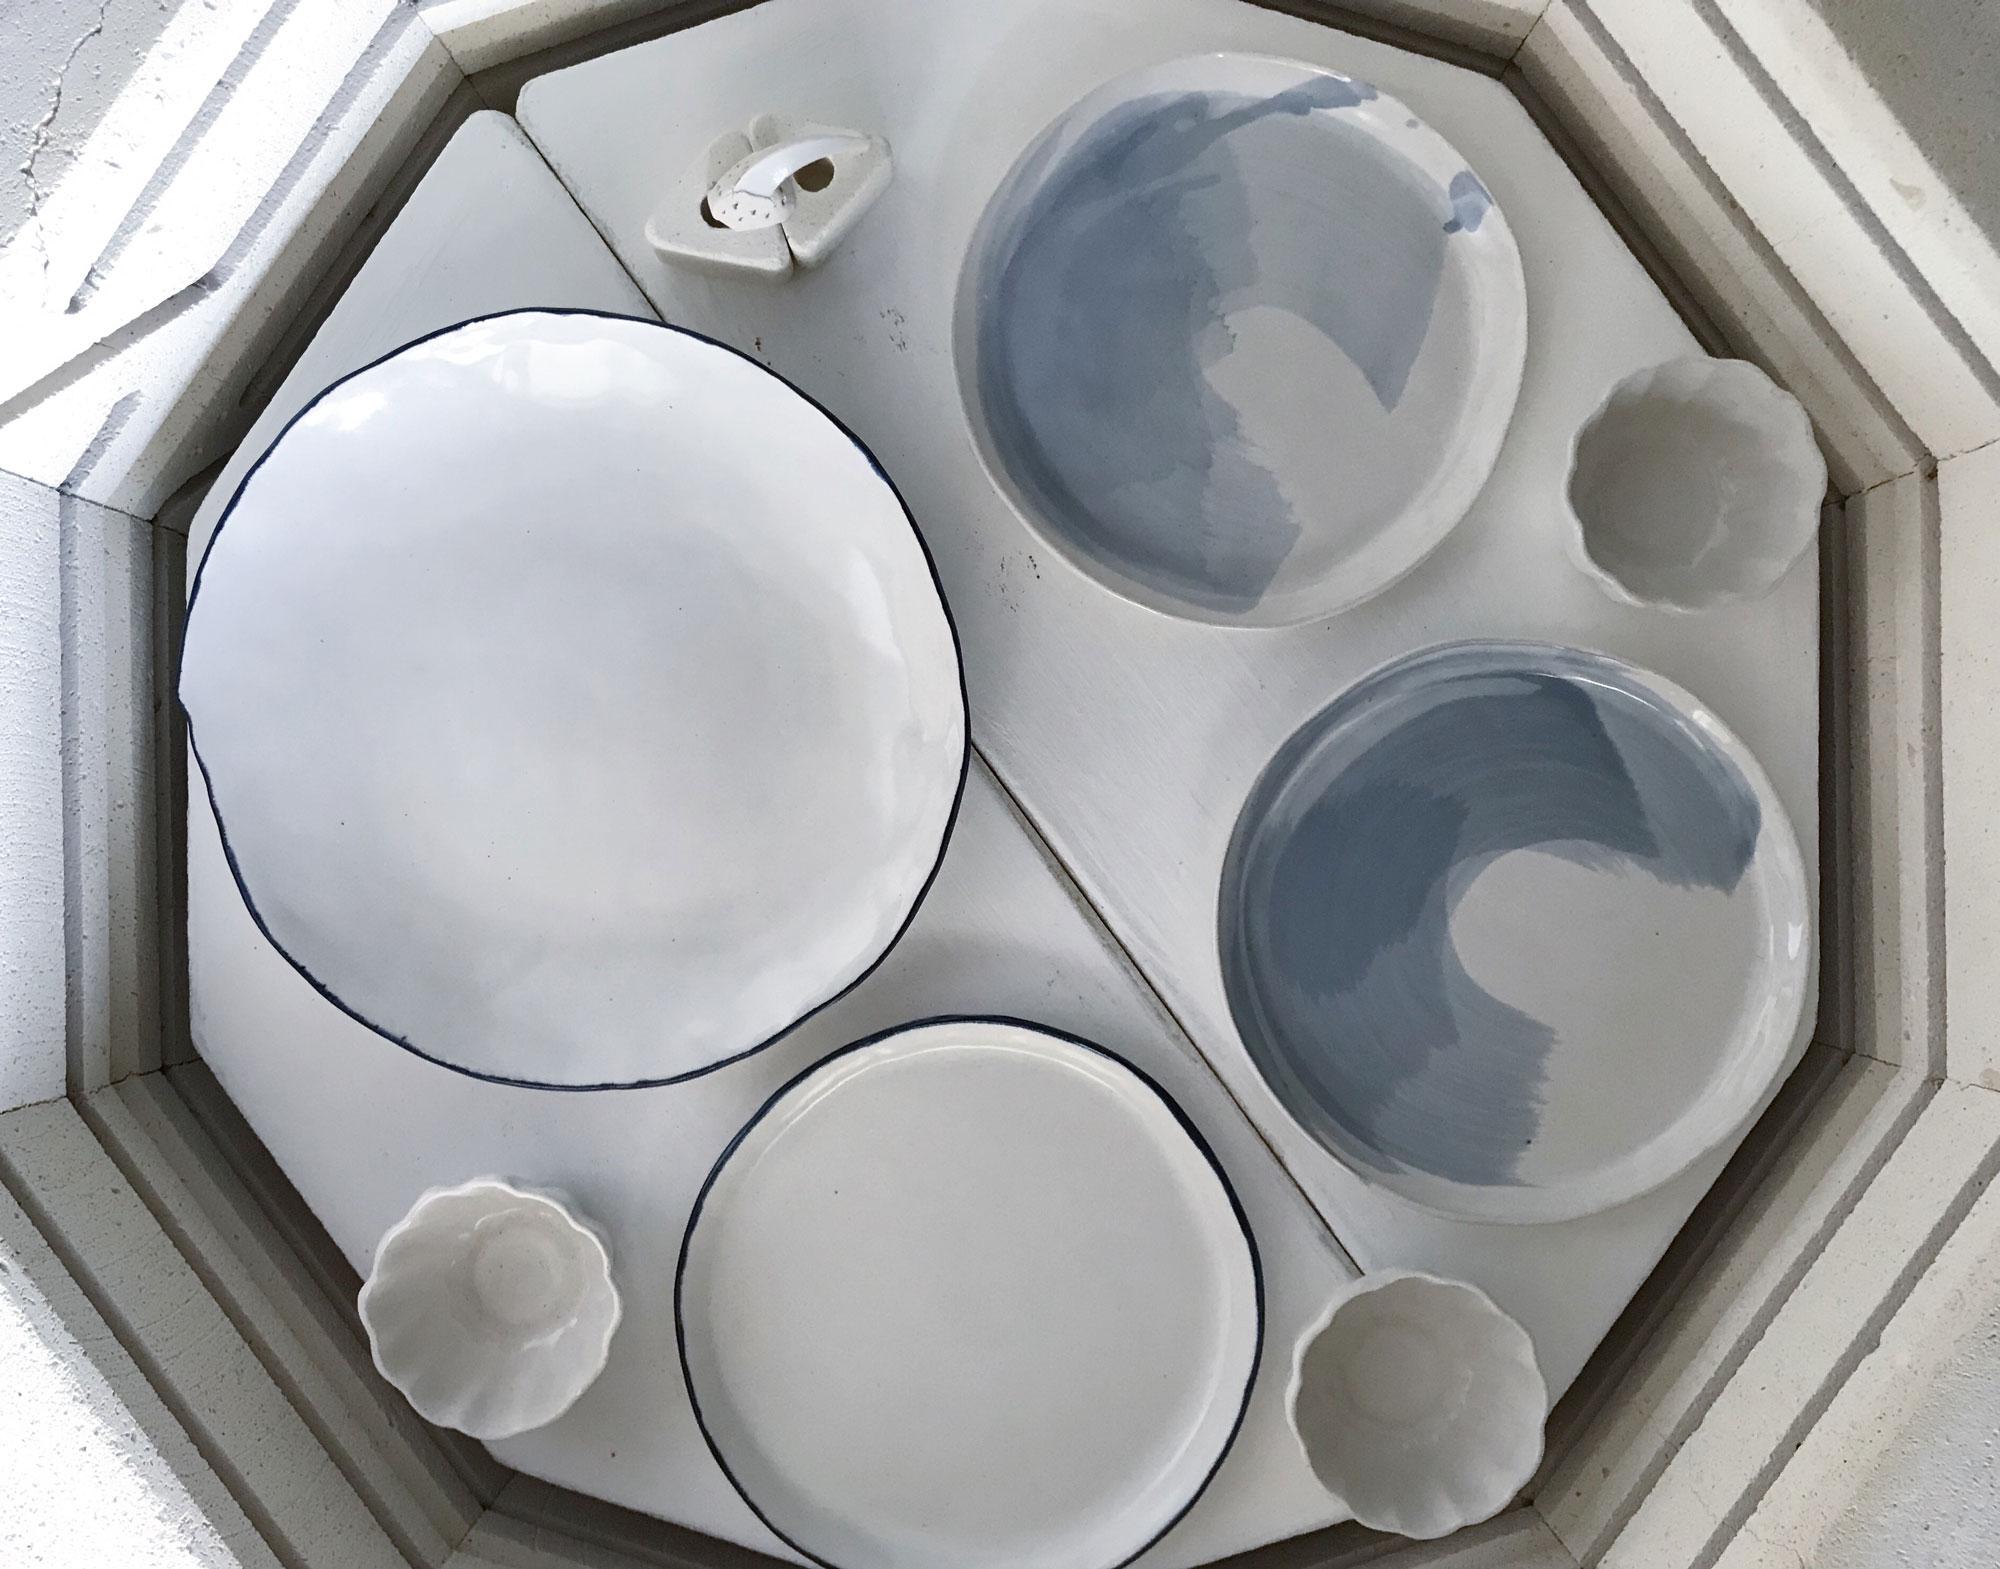 Ceramic dishes by Lee Ee Vee.